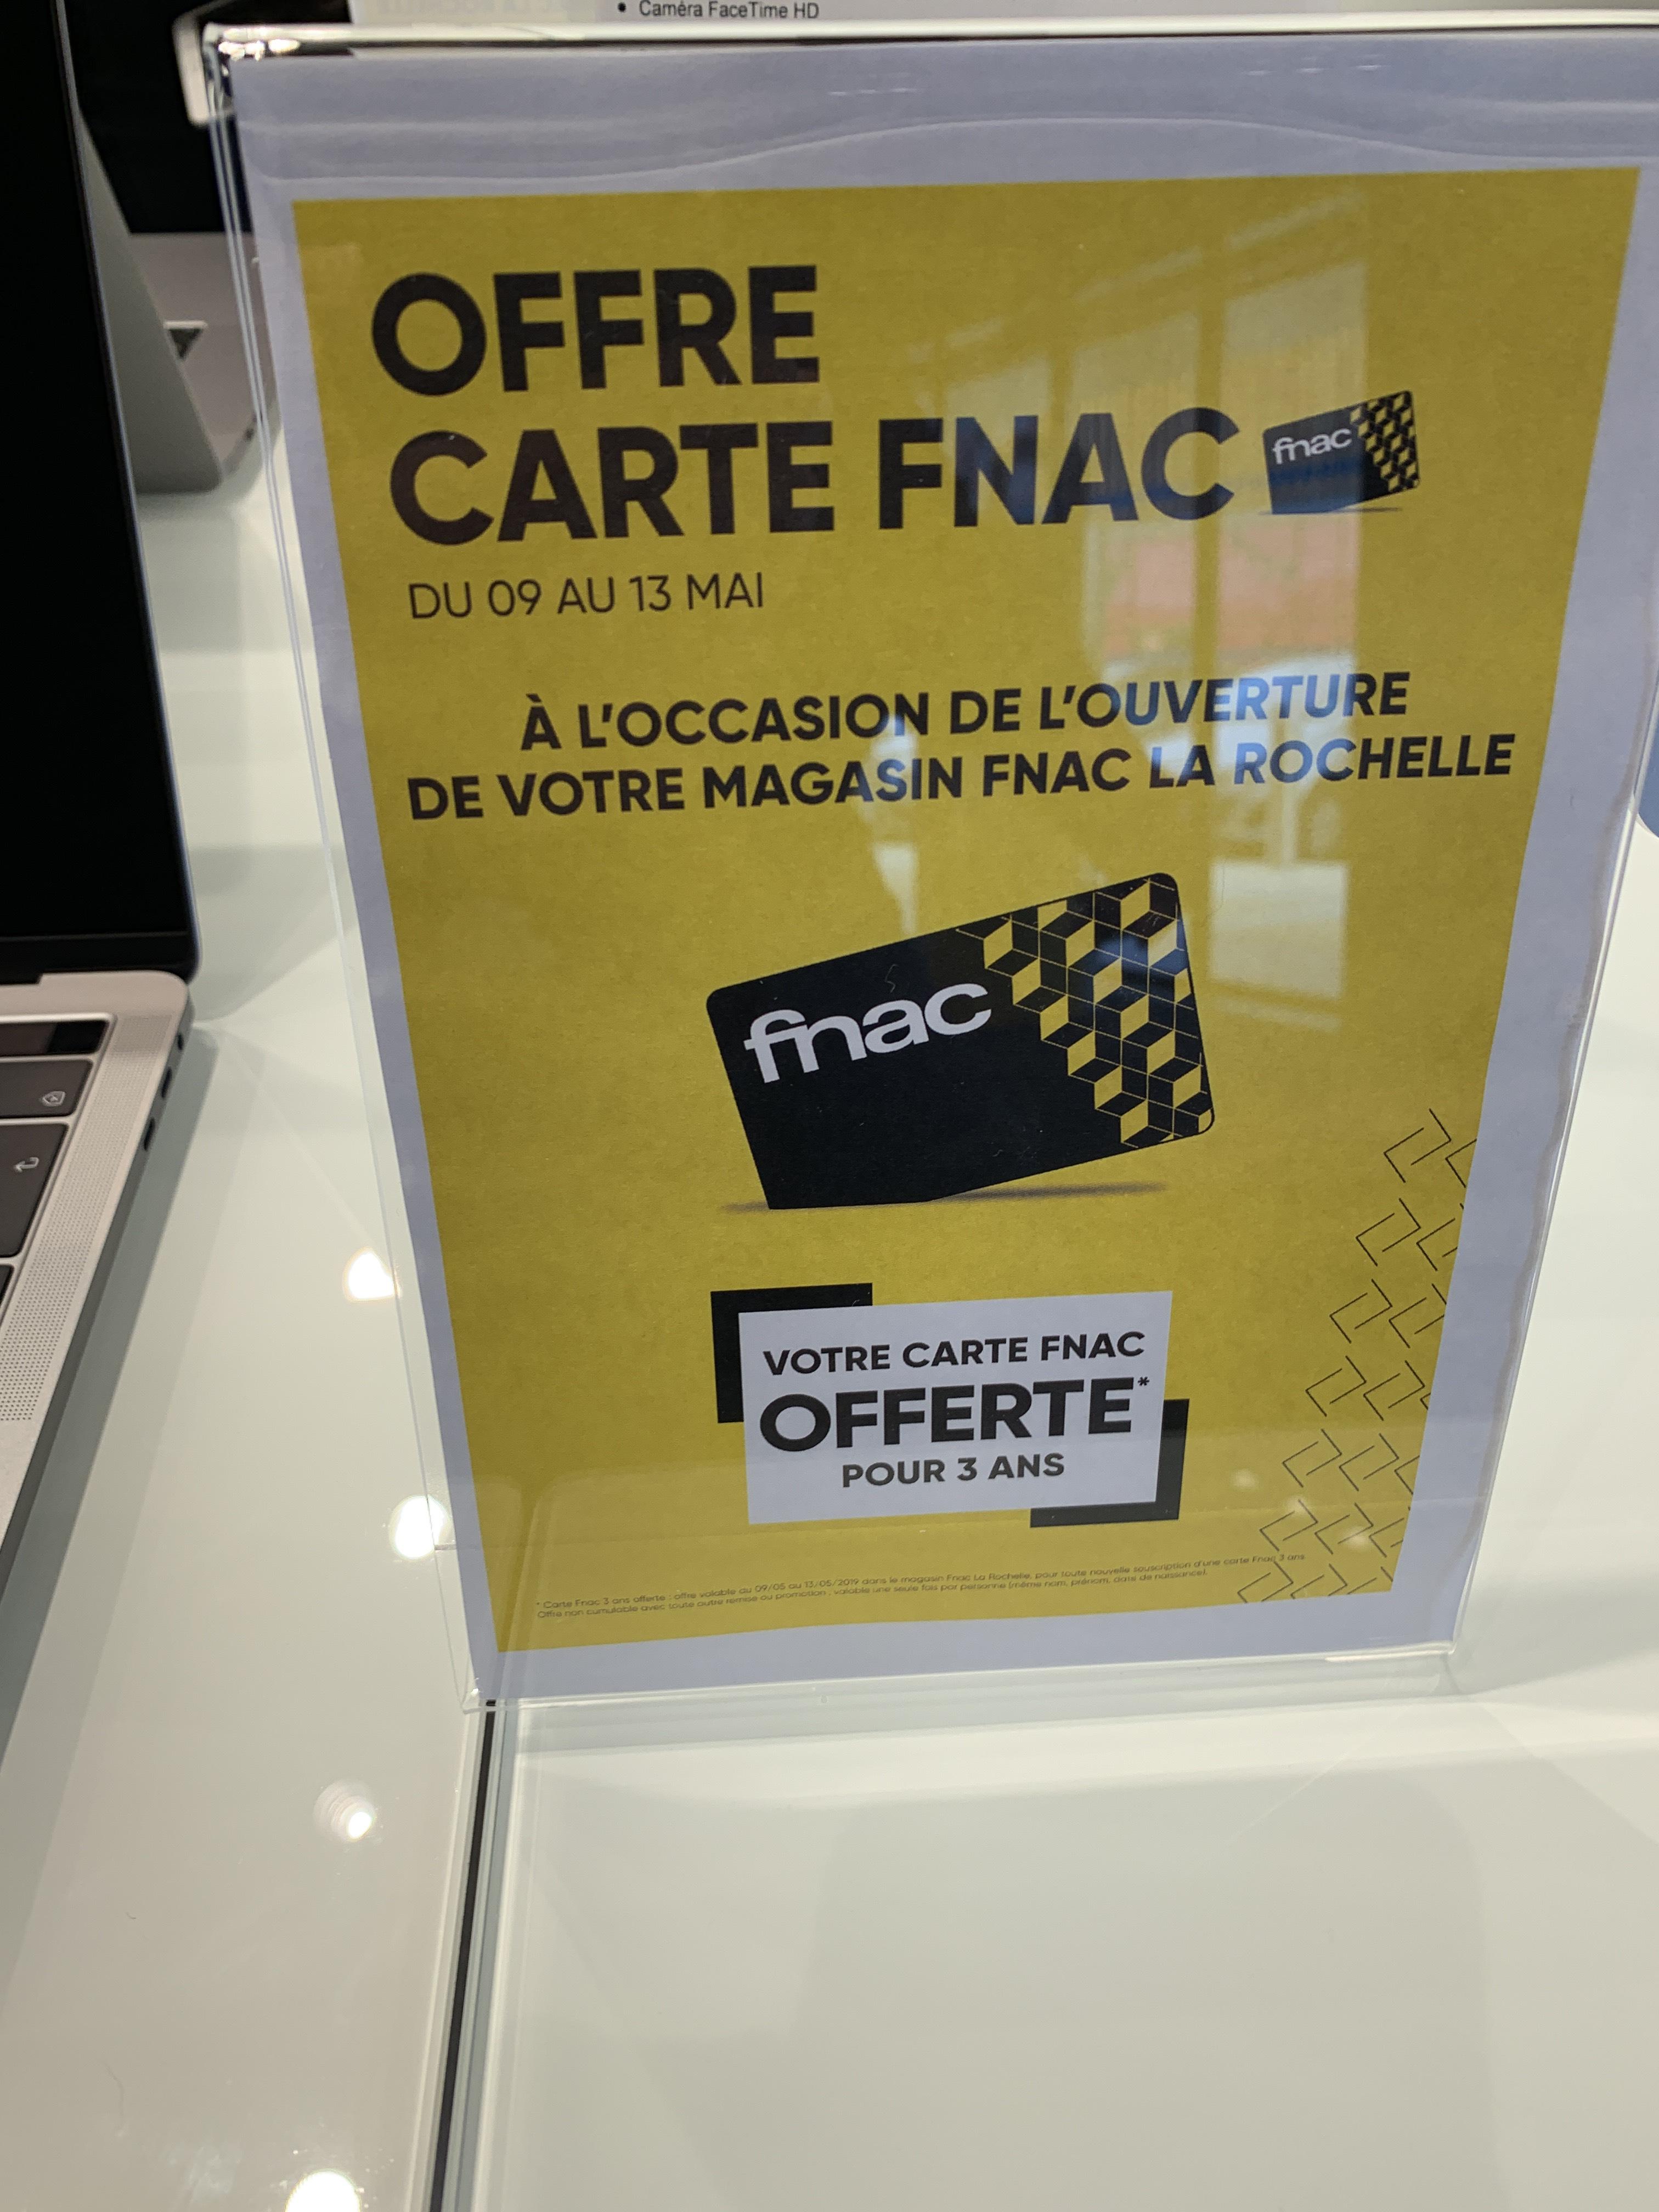 Bons Plans Adhérents Fnac Promotions En Ligne Et En Magasin Dealabs